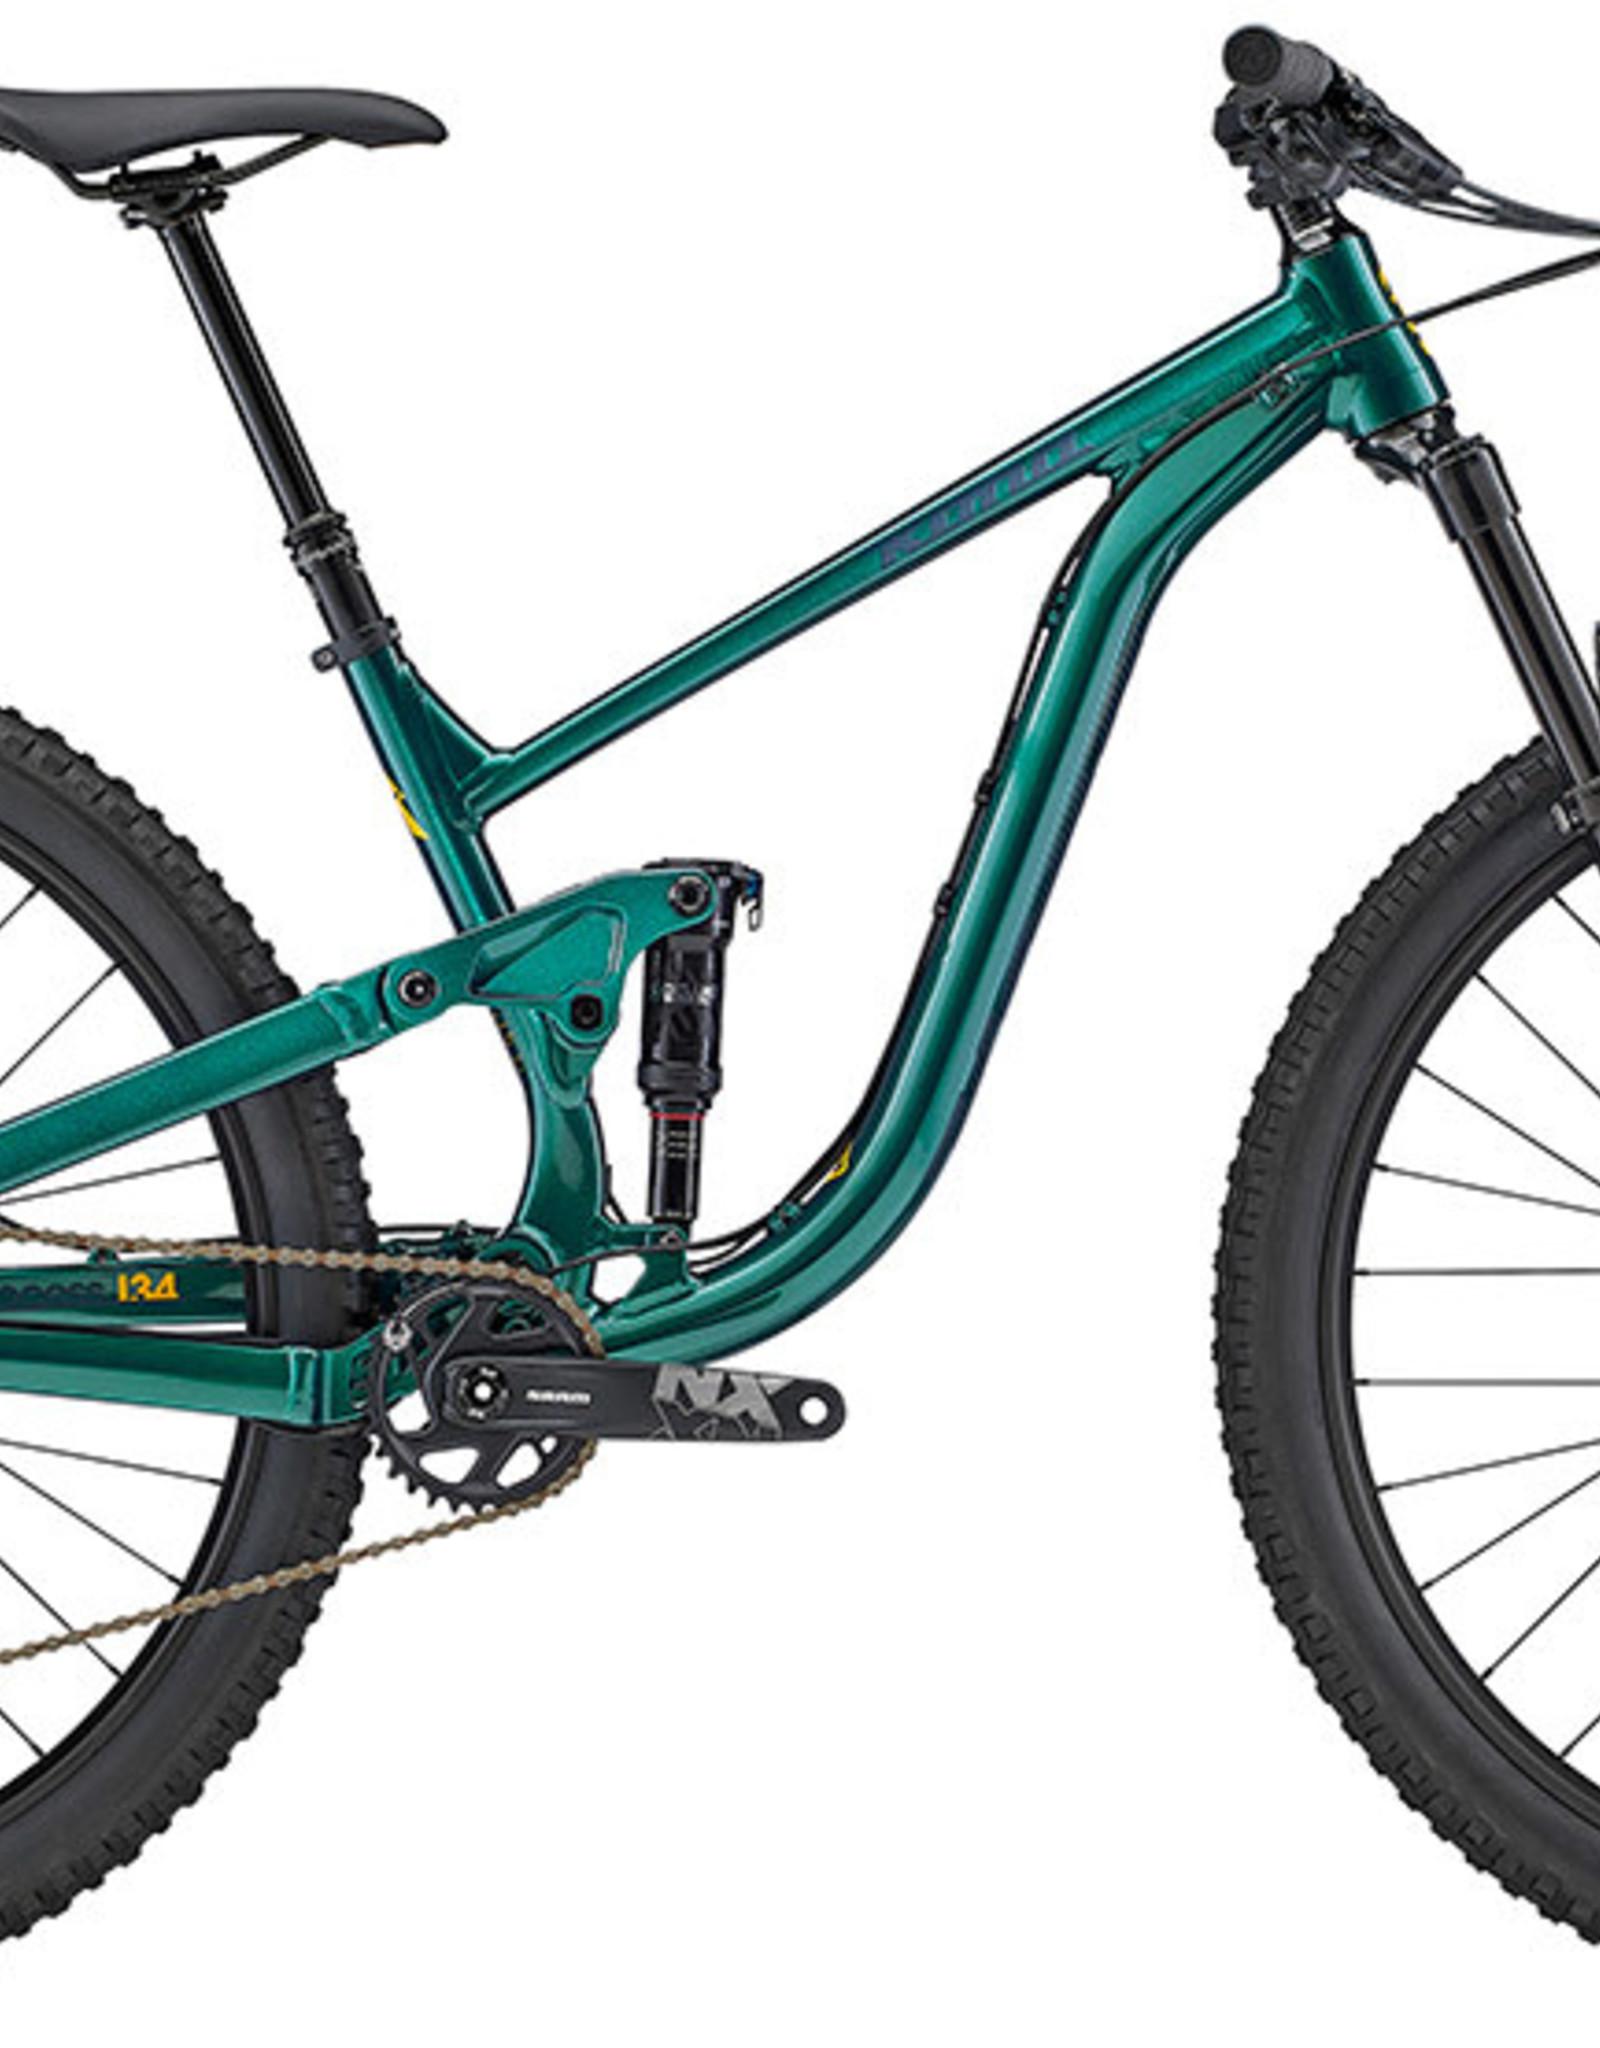 Kona Bicycles 2022 Kona Process 134 DL 29 Complete Medium